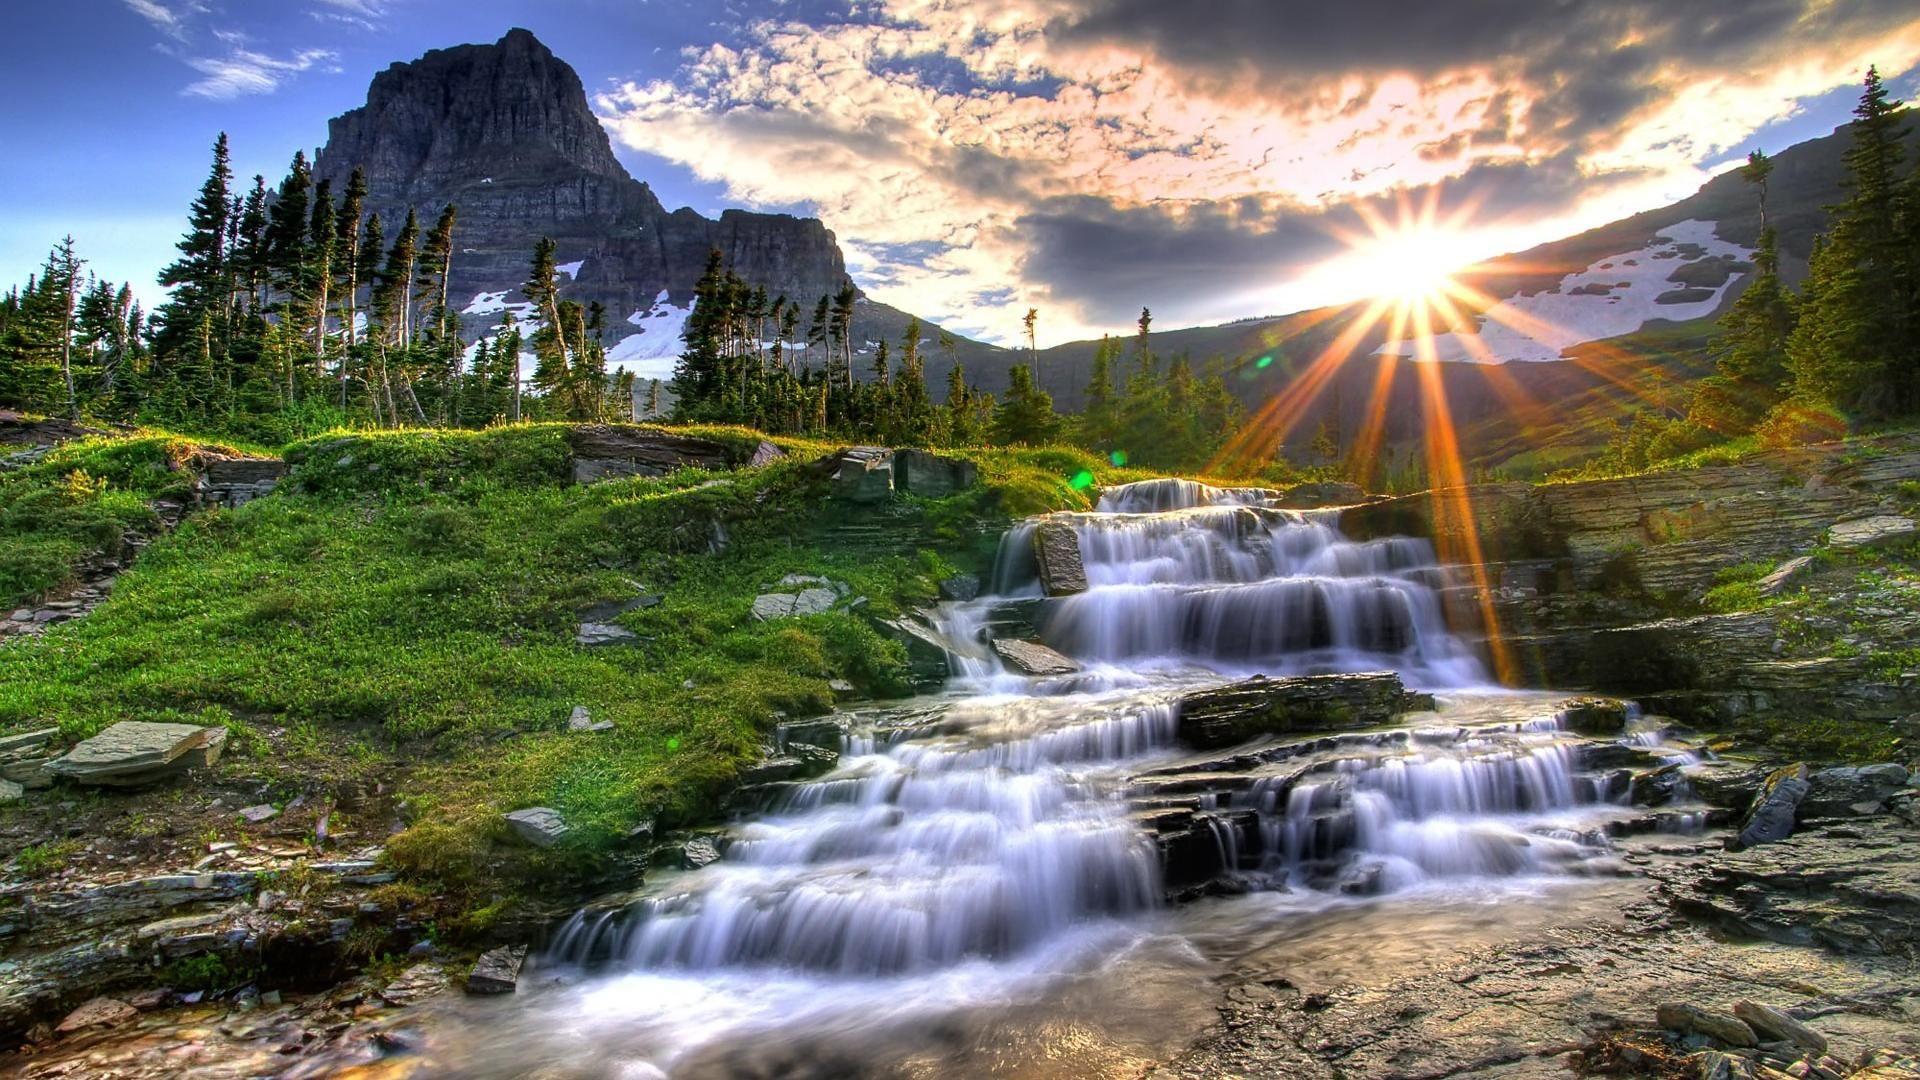 17 Best images about natural landscape on Pinterest | Beautiful ...